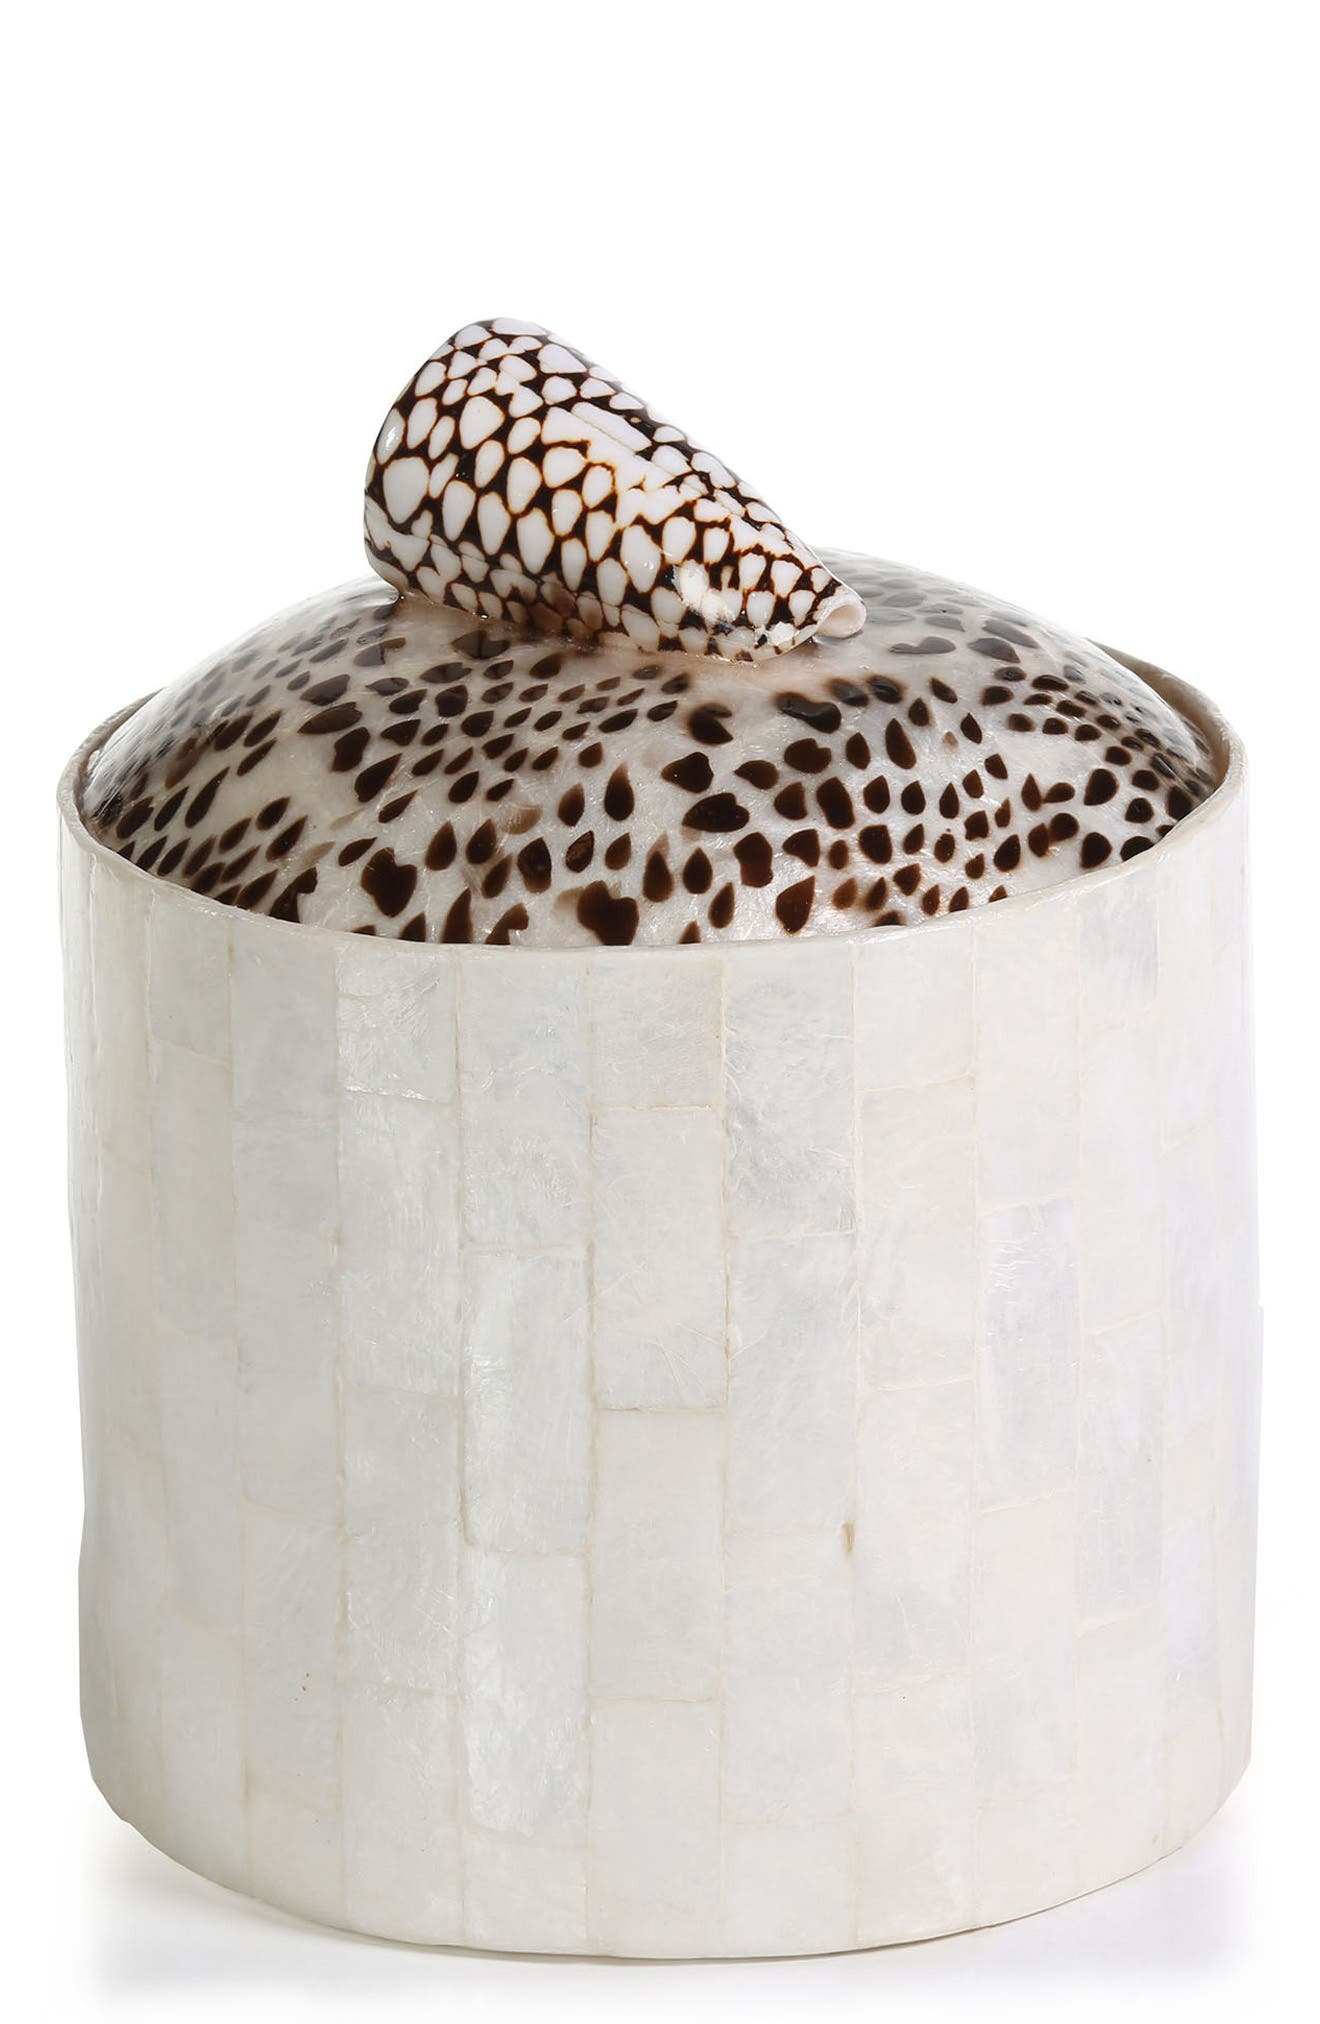 Capiz Shell Ice Bucket,                             Main thumbnail 1, color,                             100